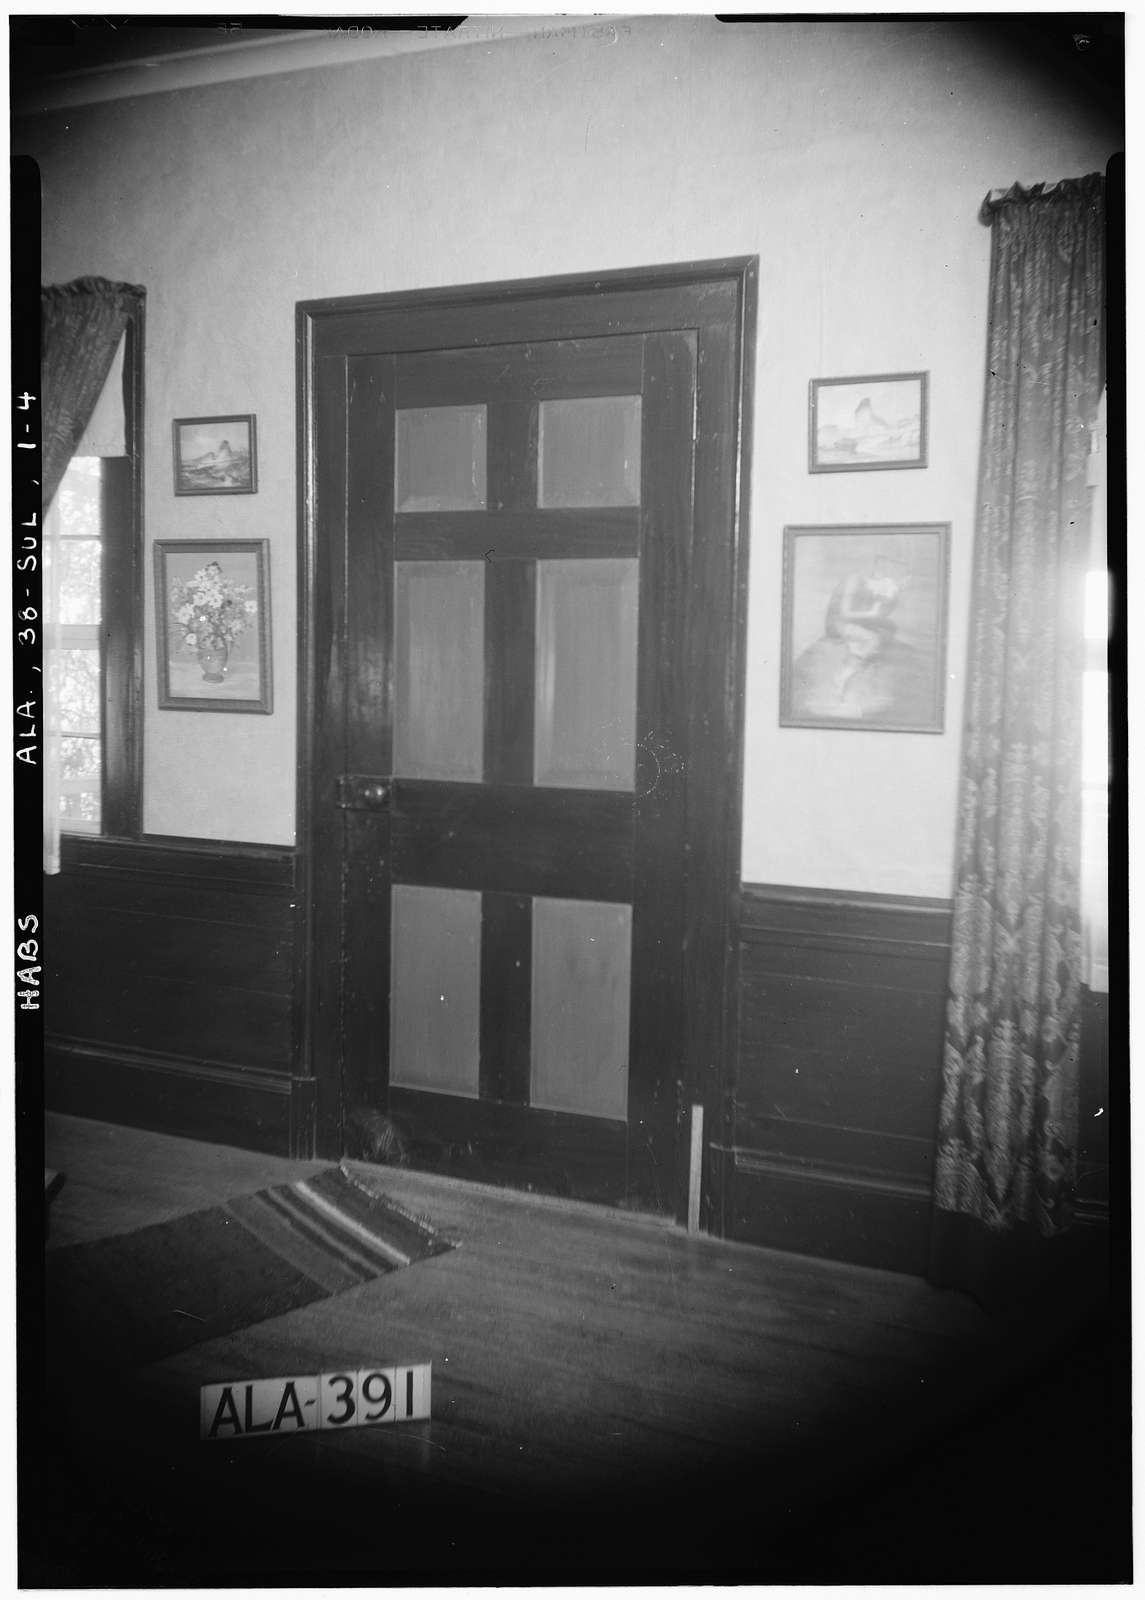 James Greer Bankhead House, U.S. Route 278, Sulligent, Lamar County, AL